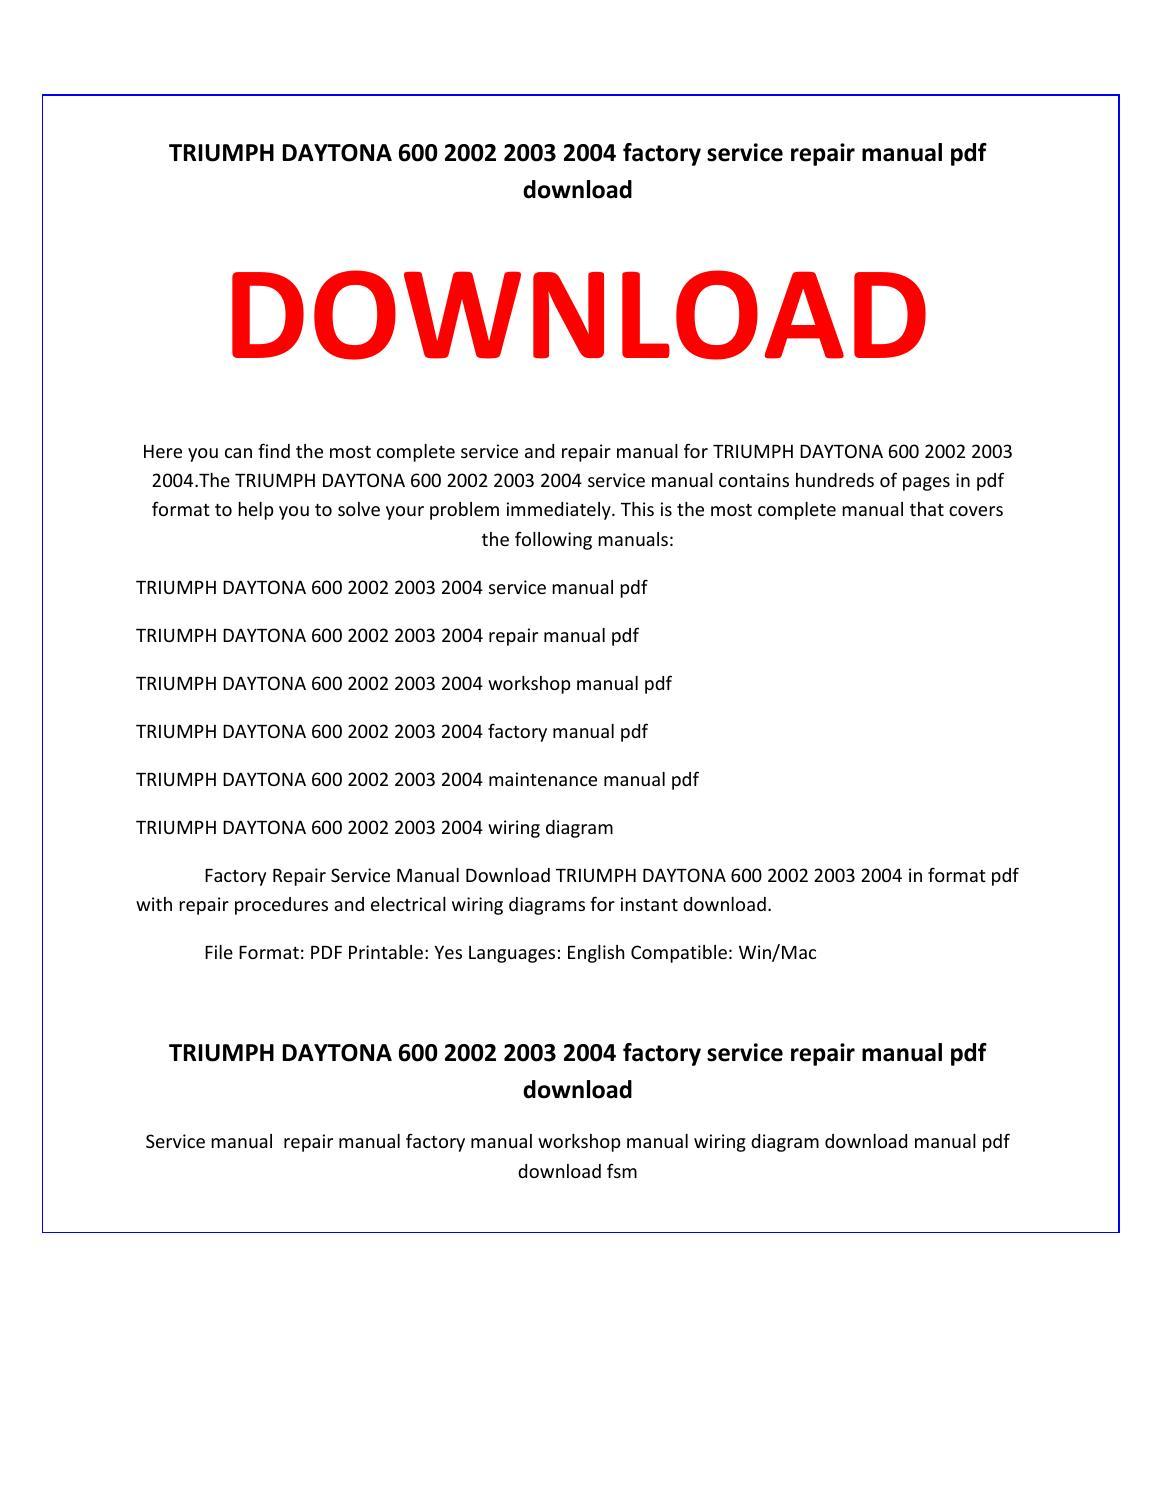 Triumph Daytona 600 Wiring Diagram Library Diagrams 2002 2003 2004 Service Repair Manual By Issuu